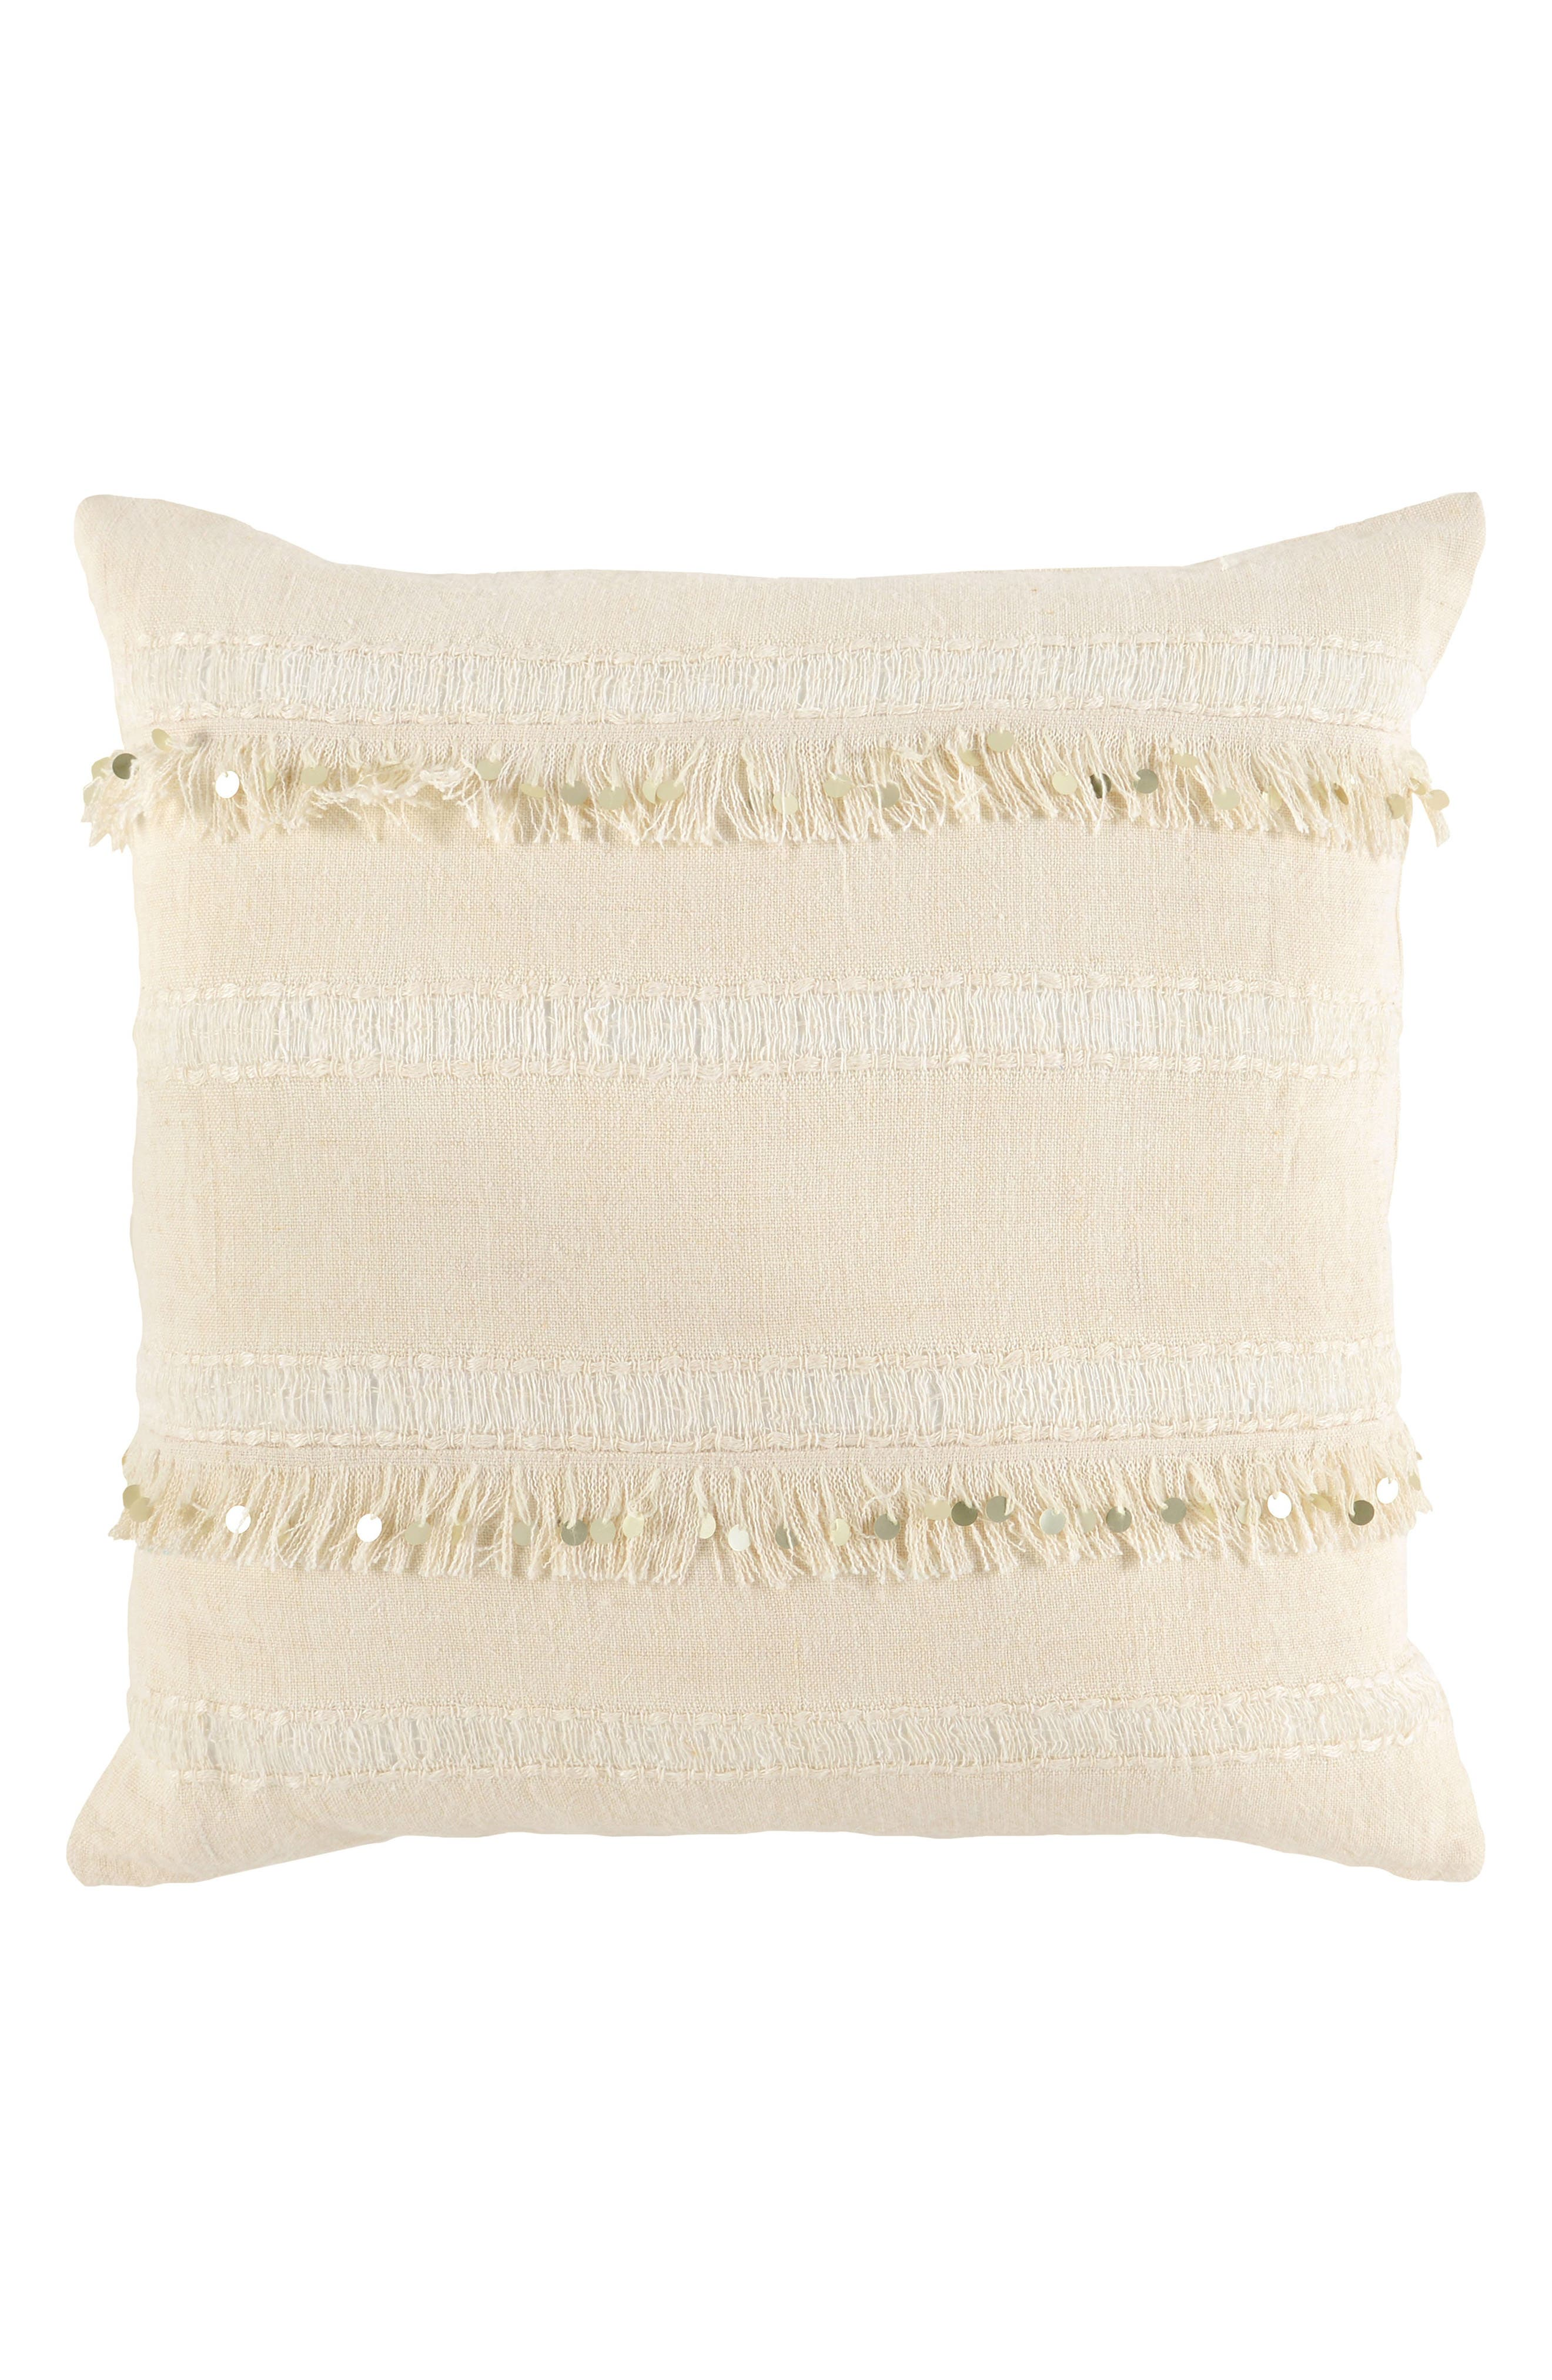 Dirade Accent Pillow,                             Main thumbnail 1, color,                             Ivory